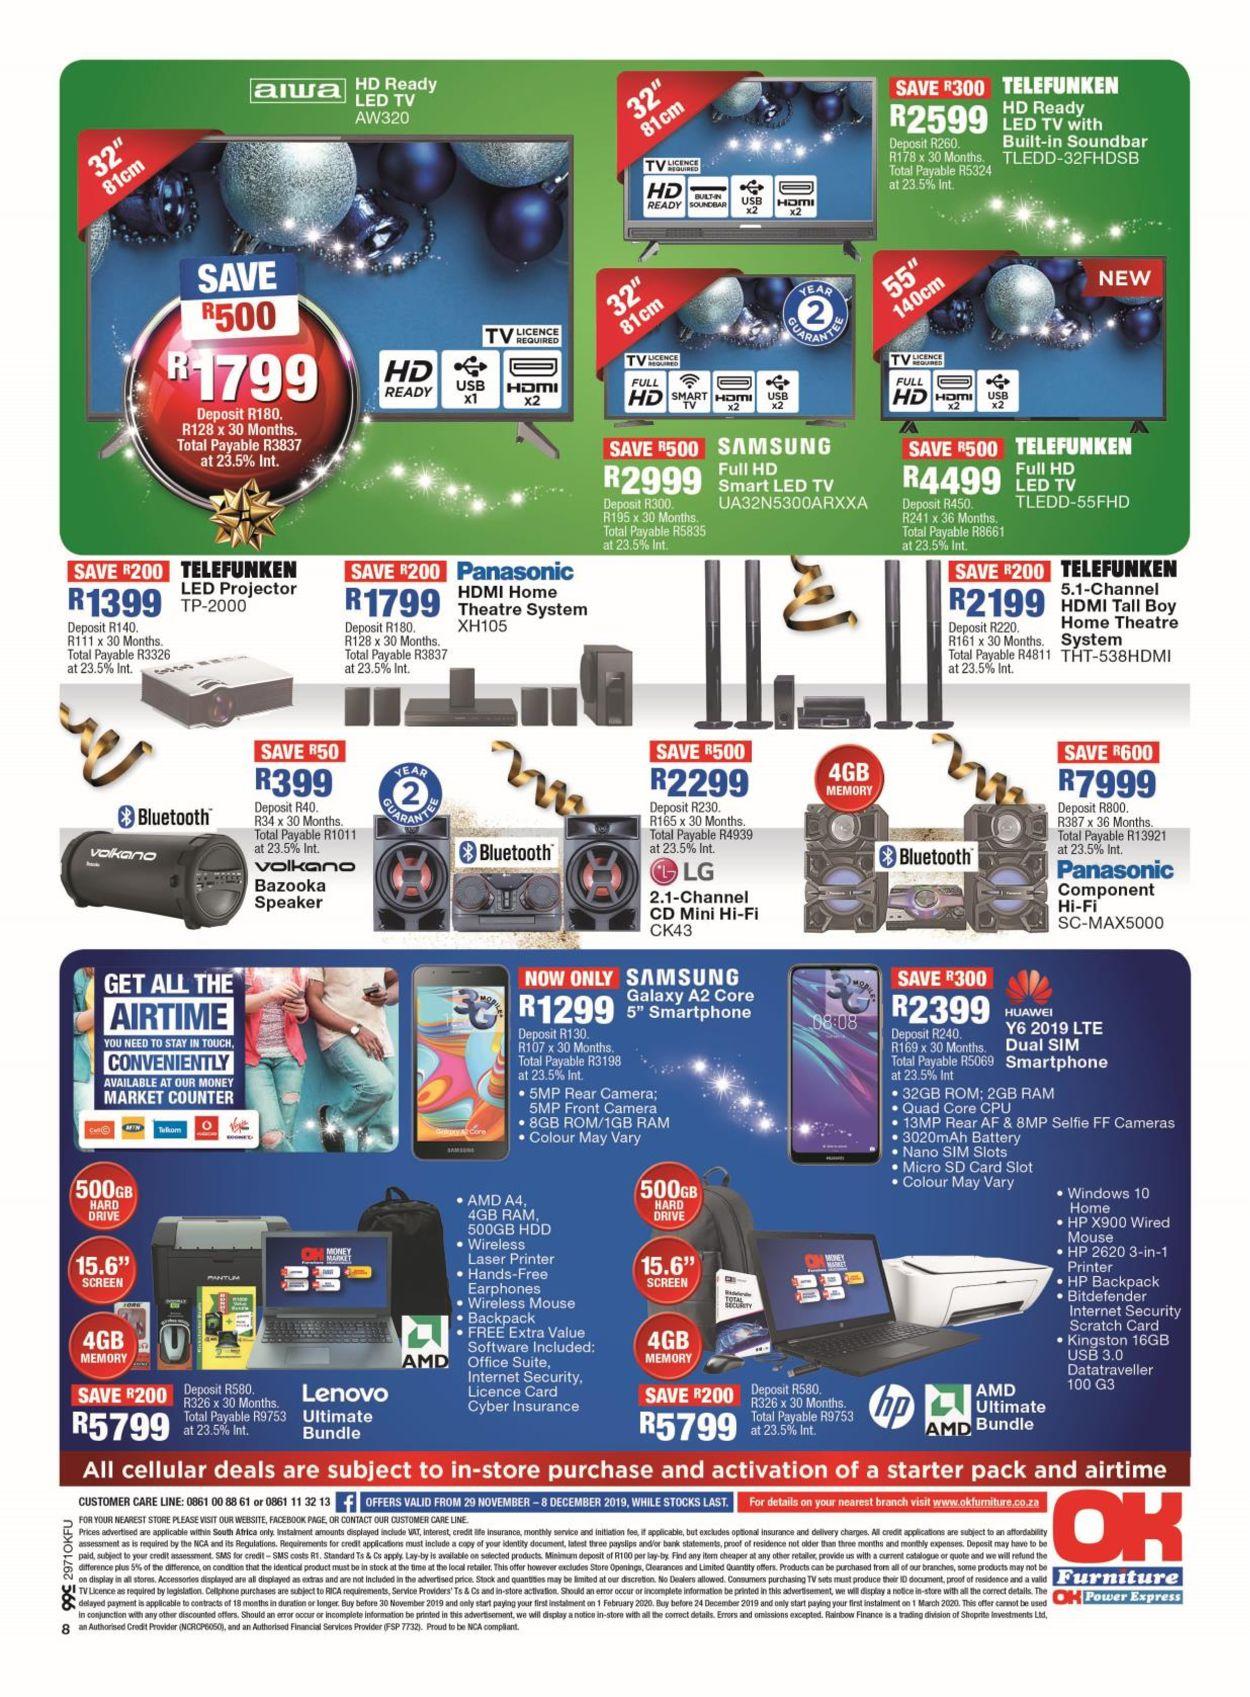 OK Furniture Christmas Catalogue 2019 Catalogue - 2019/11/29-2019/12/08 (Page 4)